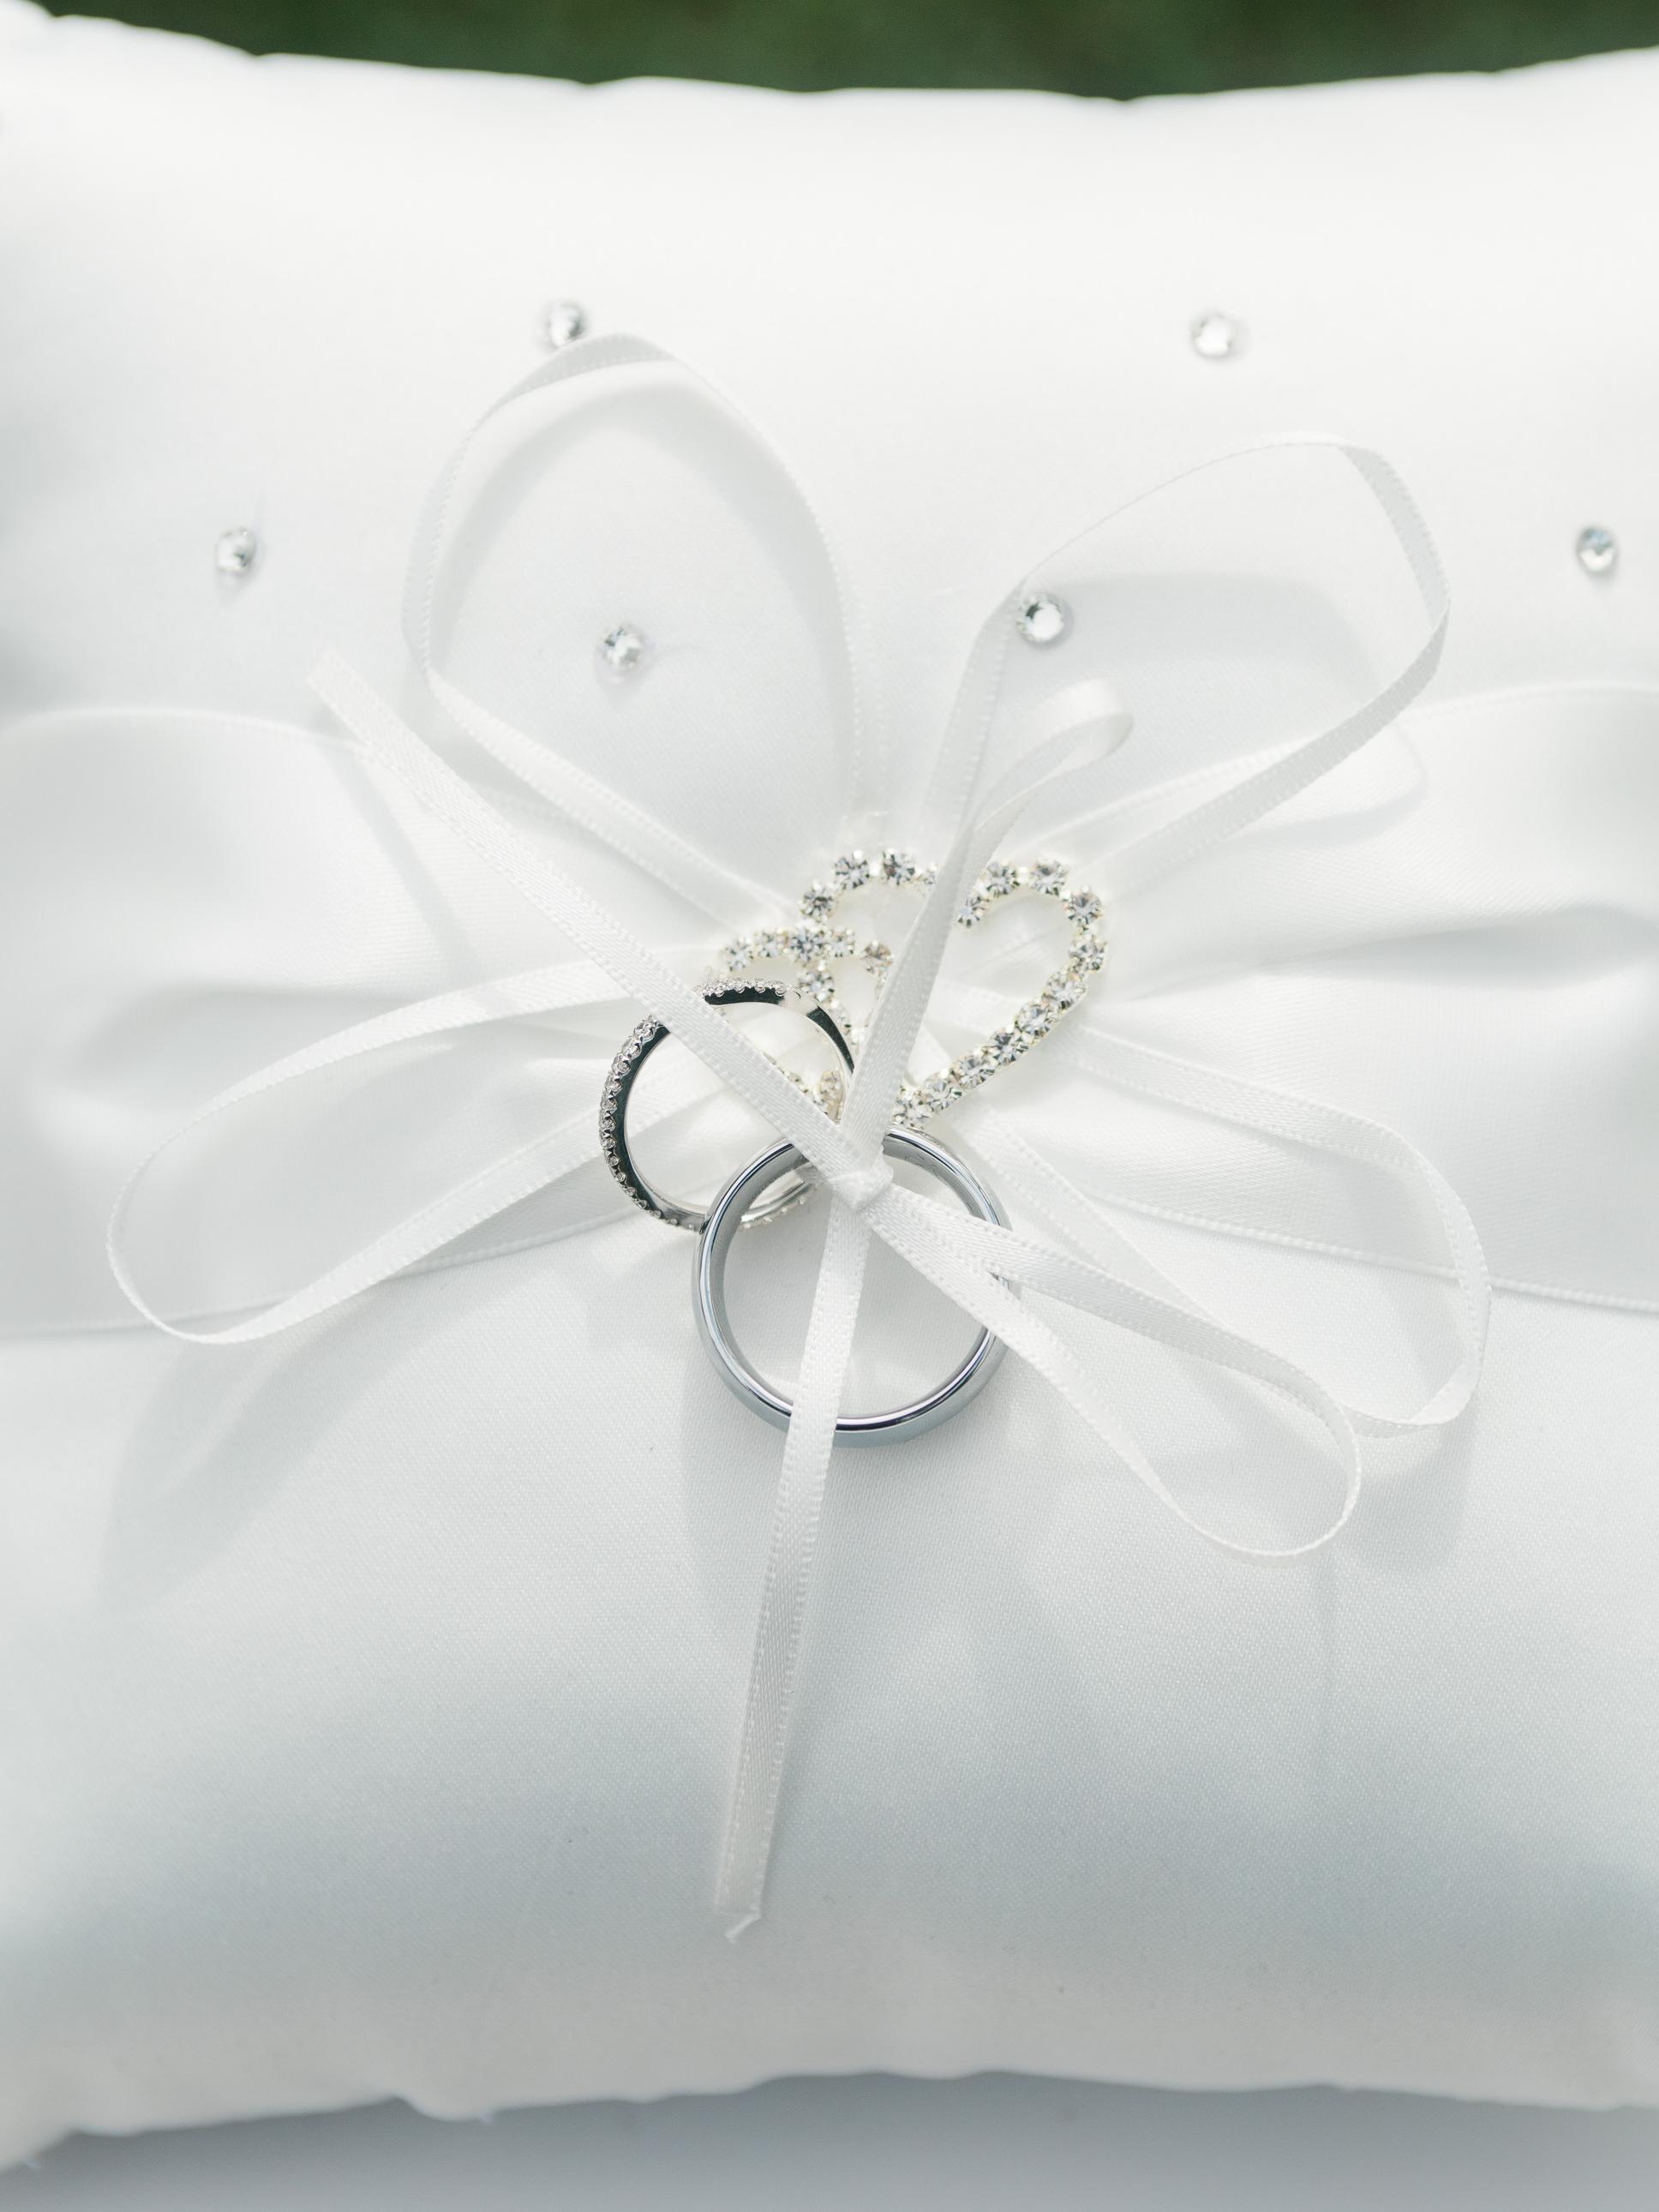 11_12_16_Robin_Mike_Pena_Wedding_0680-Edit.jpg